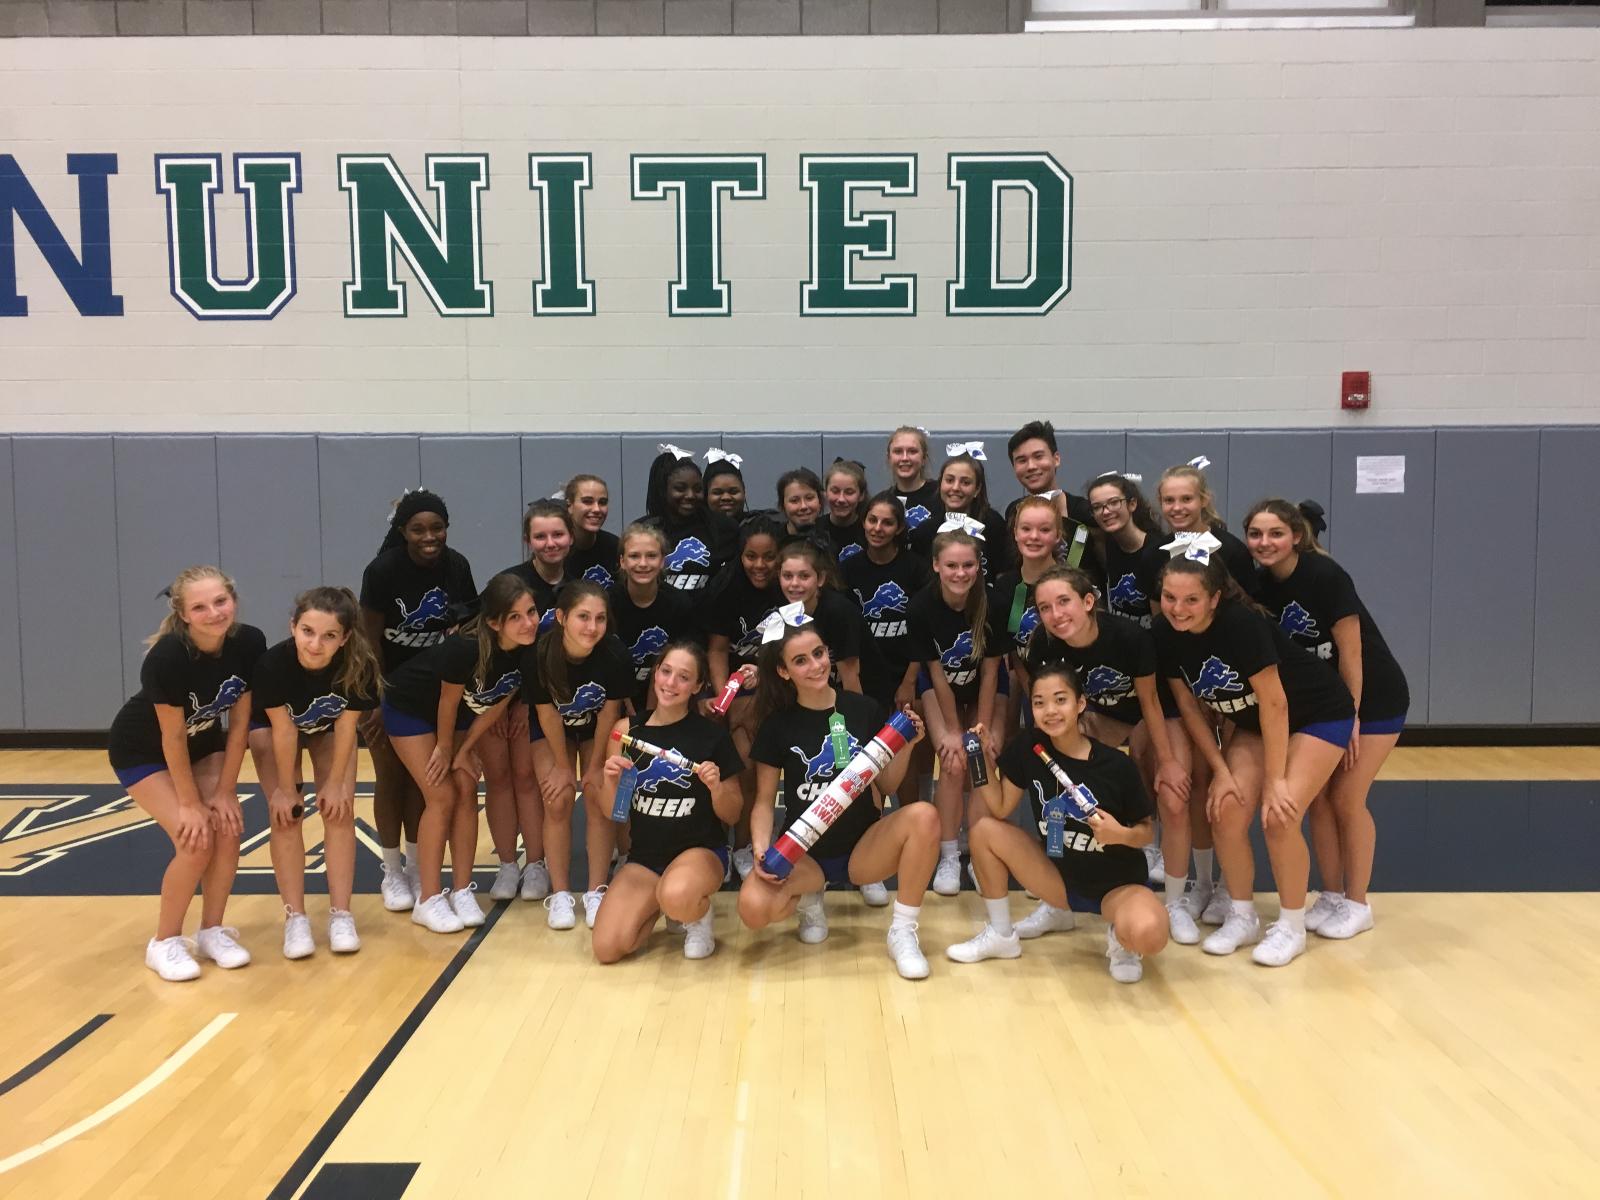 Cheer Team Wins Top Team at AmeriCheer Camp